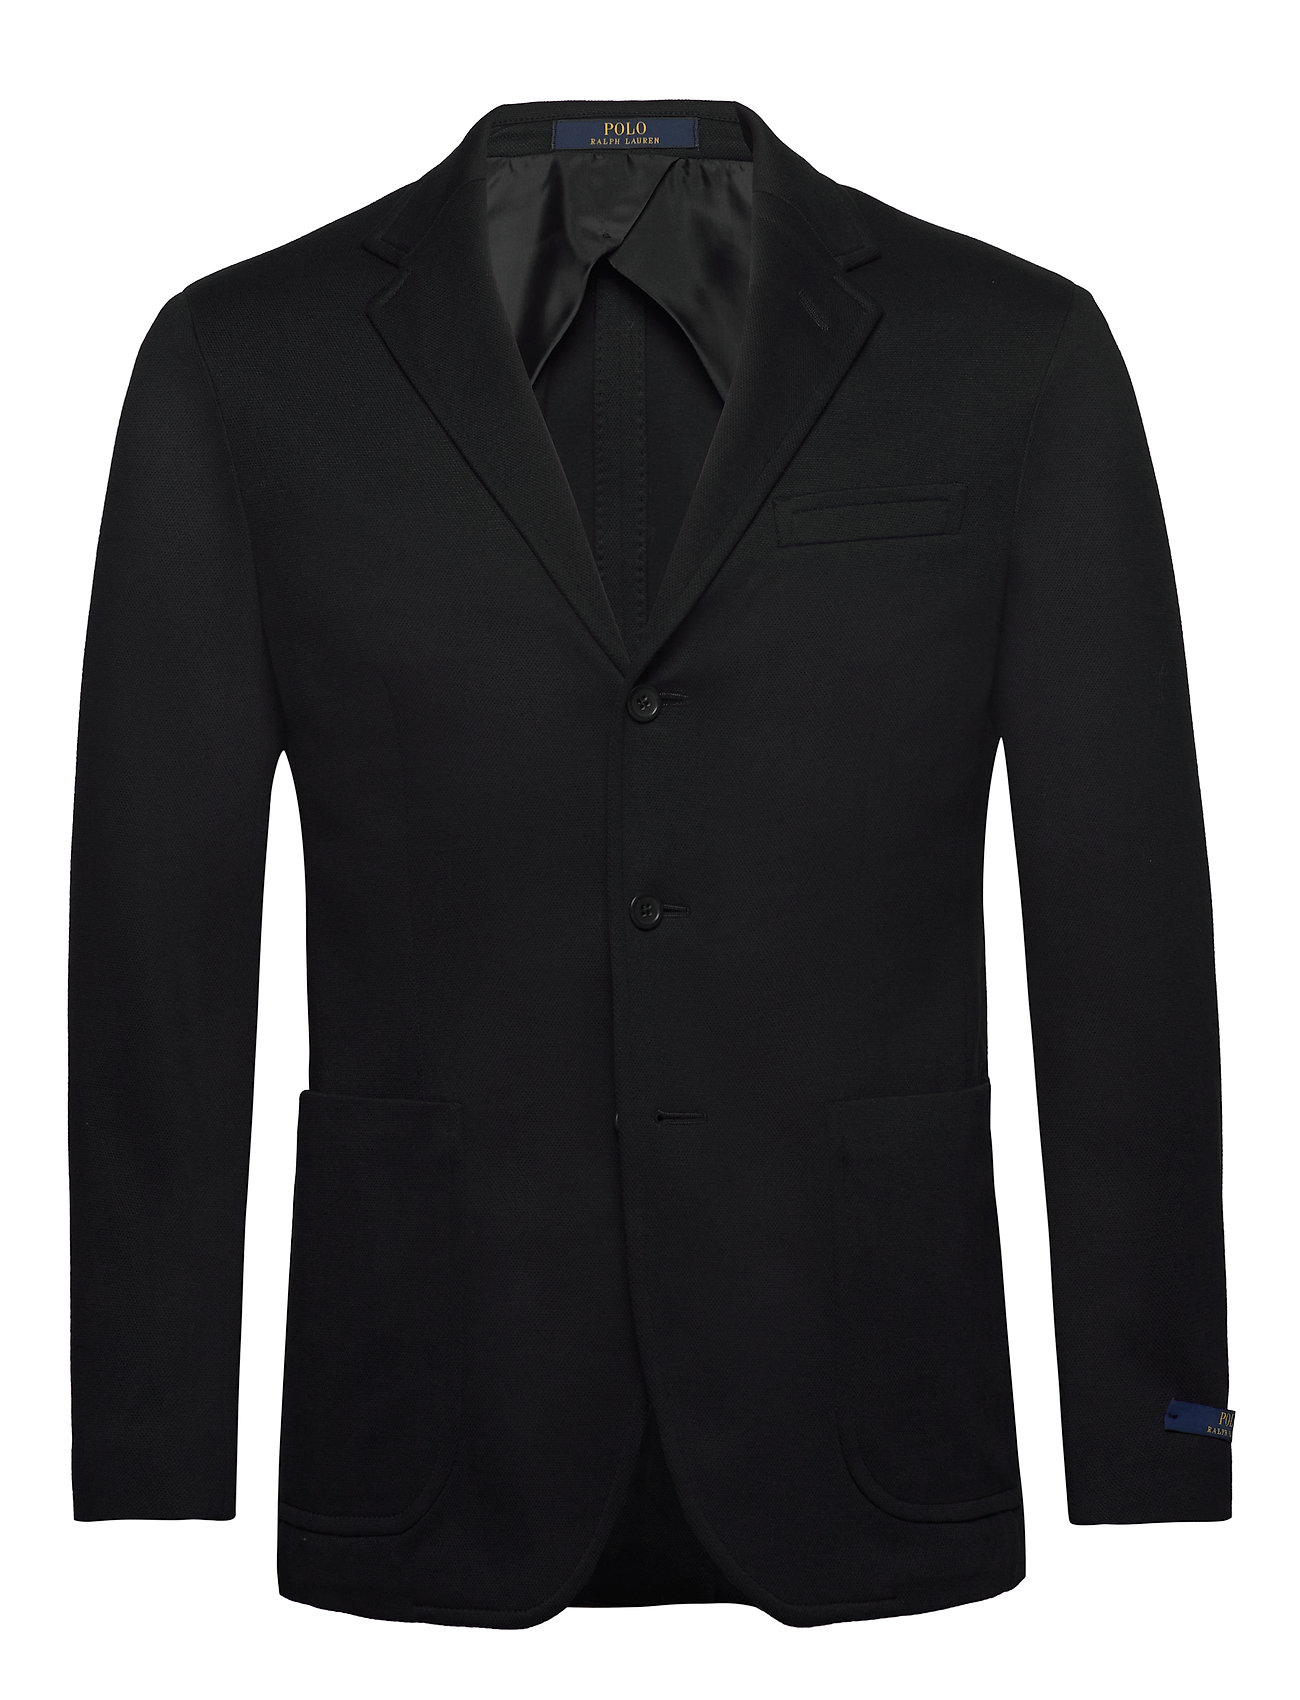 Polo Ralph Lauren Polo Soft Knit Blazer - POLO BLACK